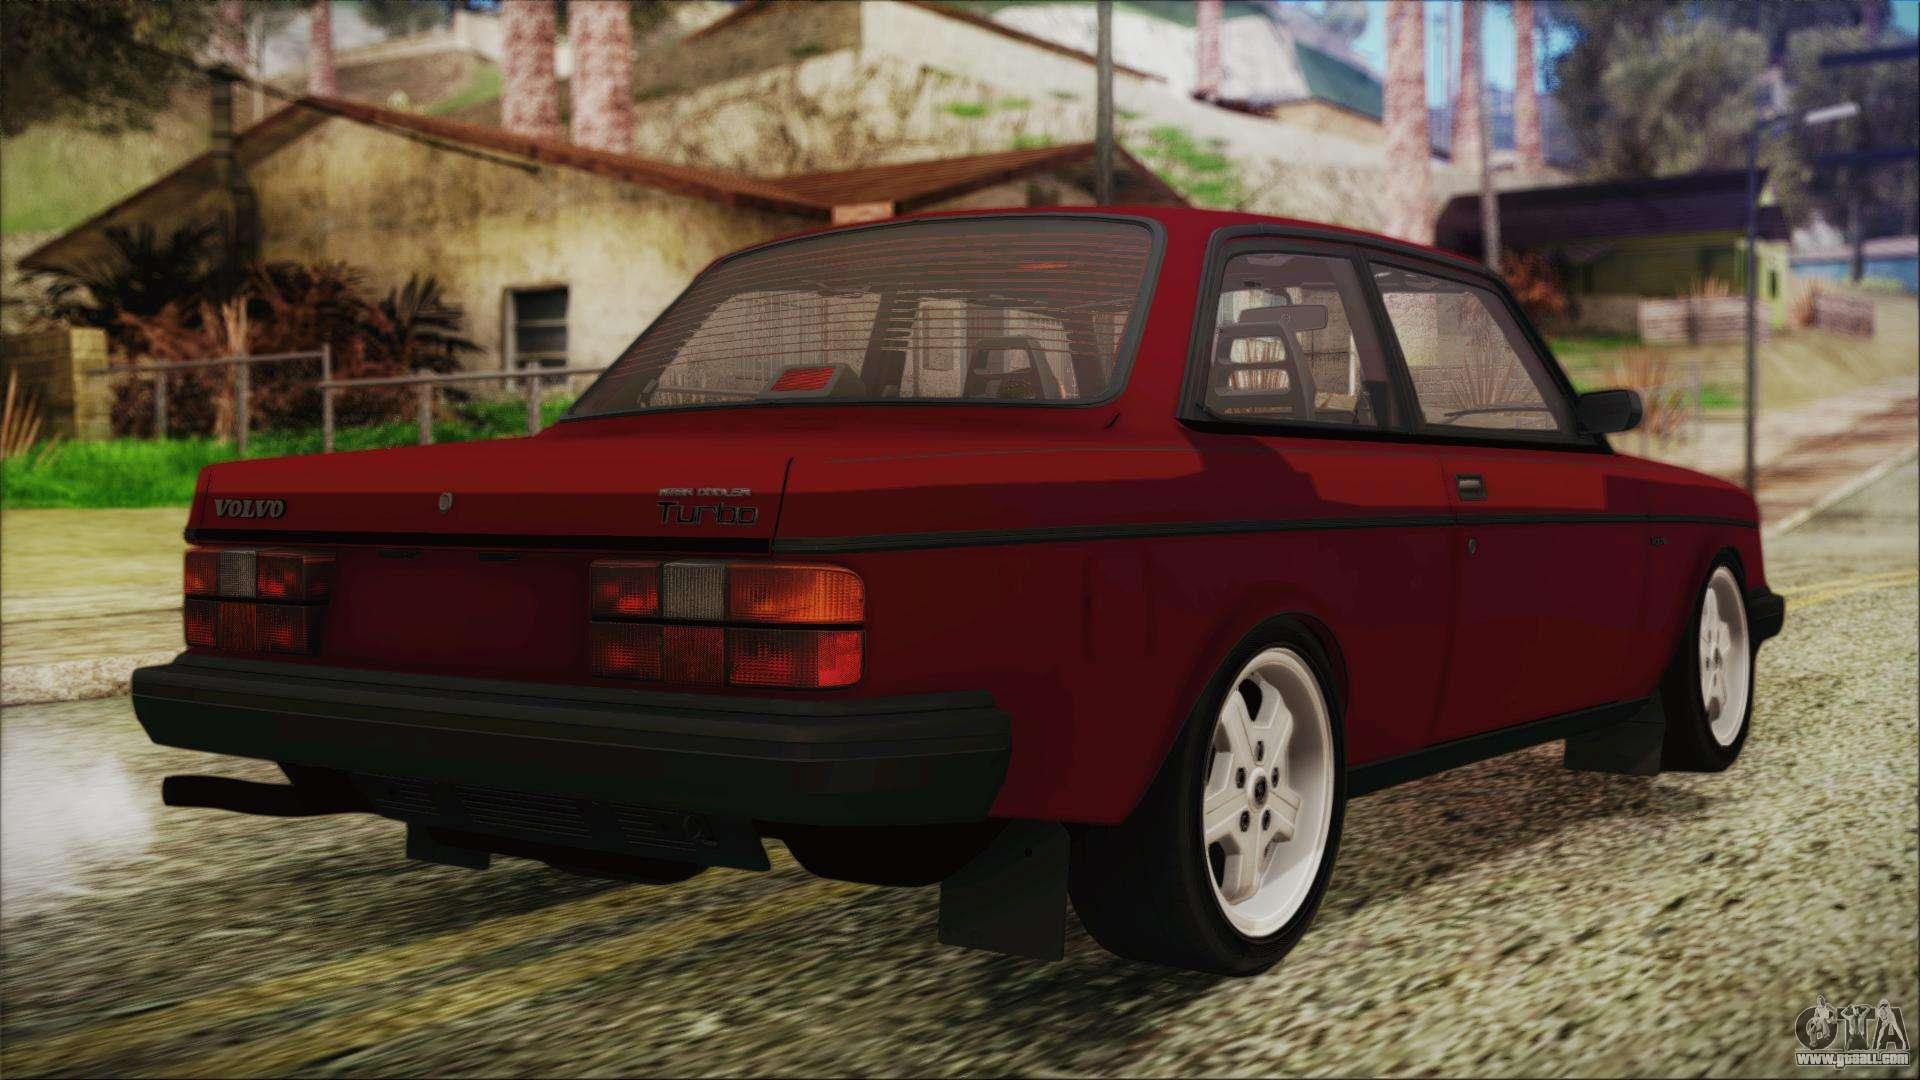 Volvo Turbo 242 Evolution Turbo 1983 For Gta San Andreas